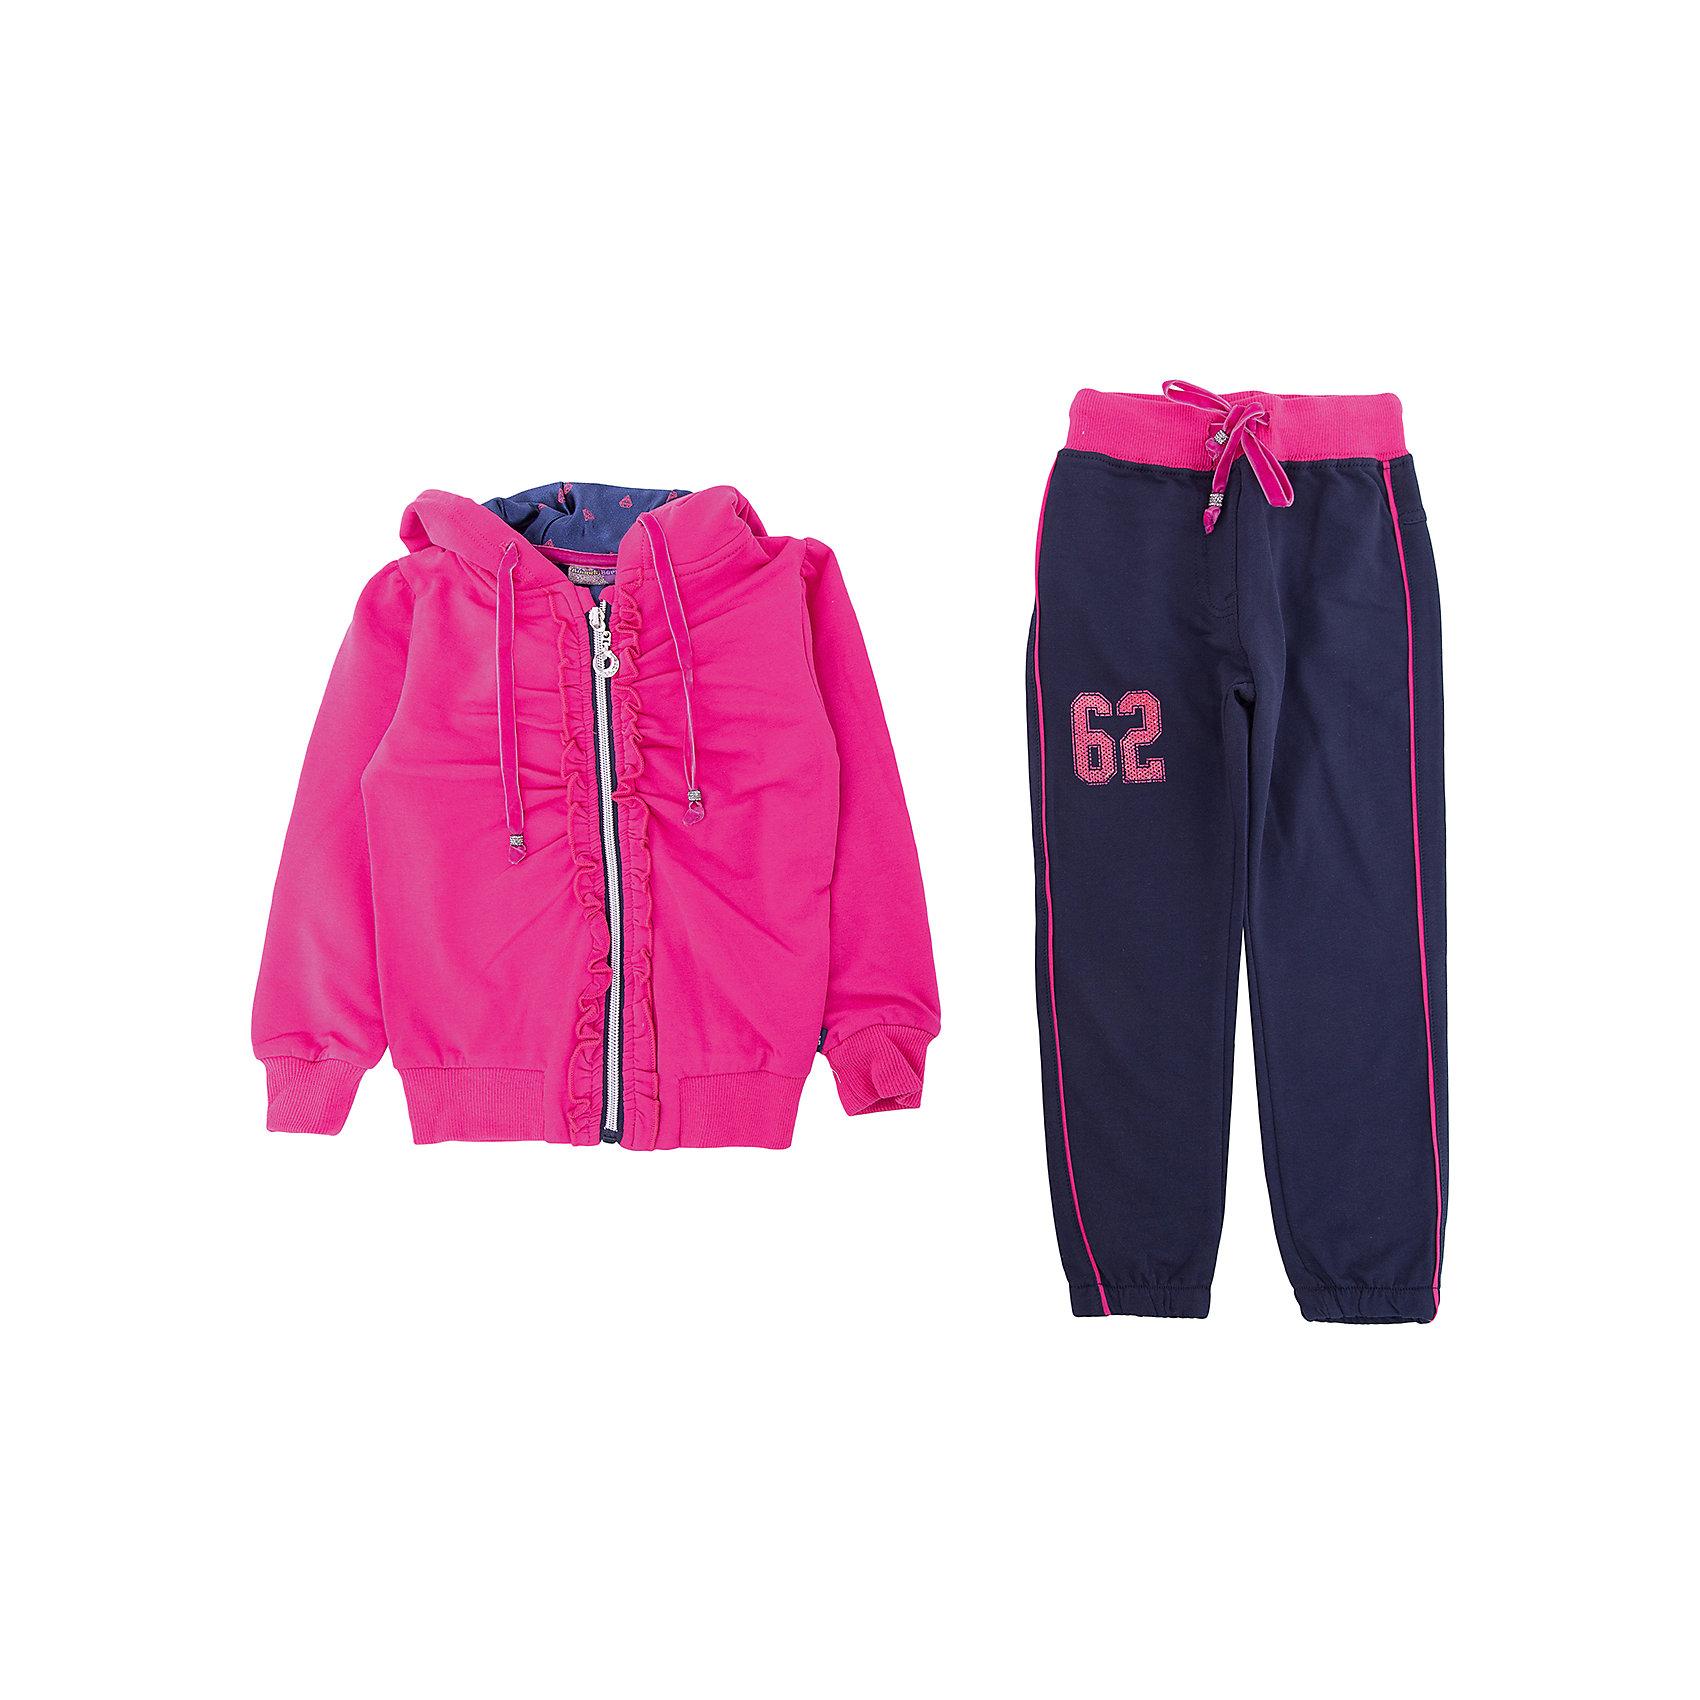 Комплект: толстовка и брюки Sweet Berry для девочкиКомплекты<br>Комплект: толстовка и брюки Sweet Berry для девочки<br><br>Состав:<br>95% хлопок, 5% эластан<br><br>Ширина мм: 356<br>Глубина мм: 10<br>Высота мм: 245<br>Вес г: 519<br>Цвет: розовый<br>Возраст от месяцев: 84<br>Возраст до месяцев: 96<br>Пол: Женский<br>Возраст: Детский<br>Размер: 128,98,104,110,116,122<br>SKU: 7096586